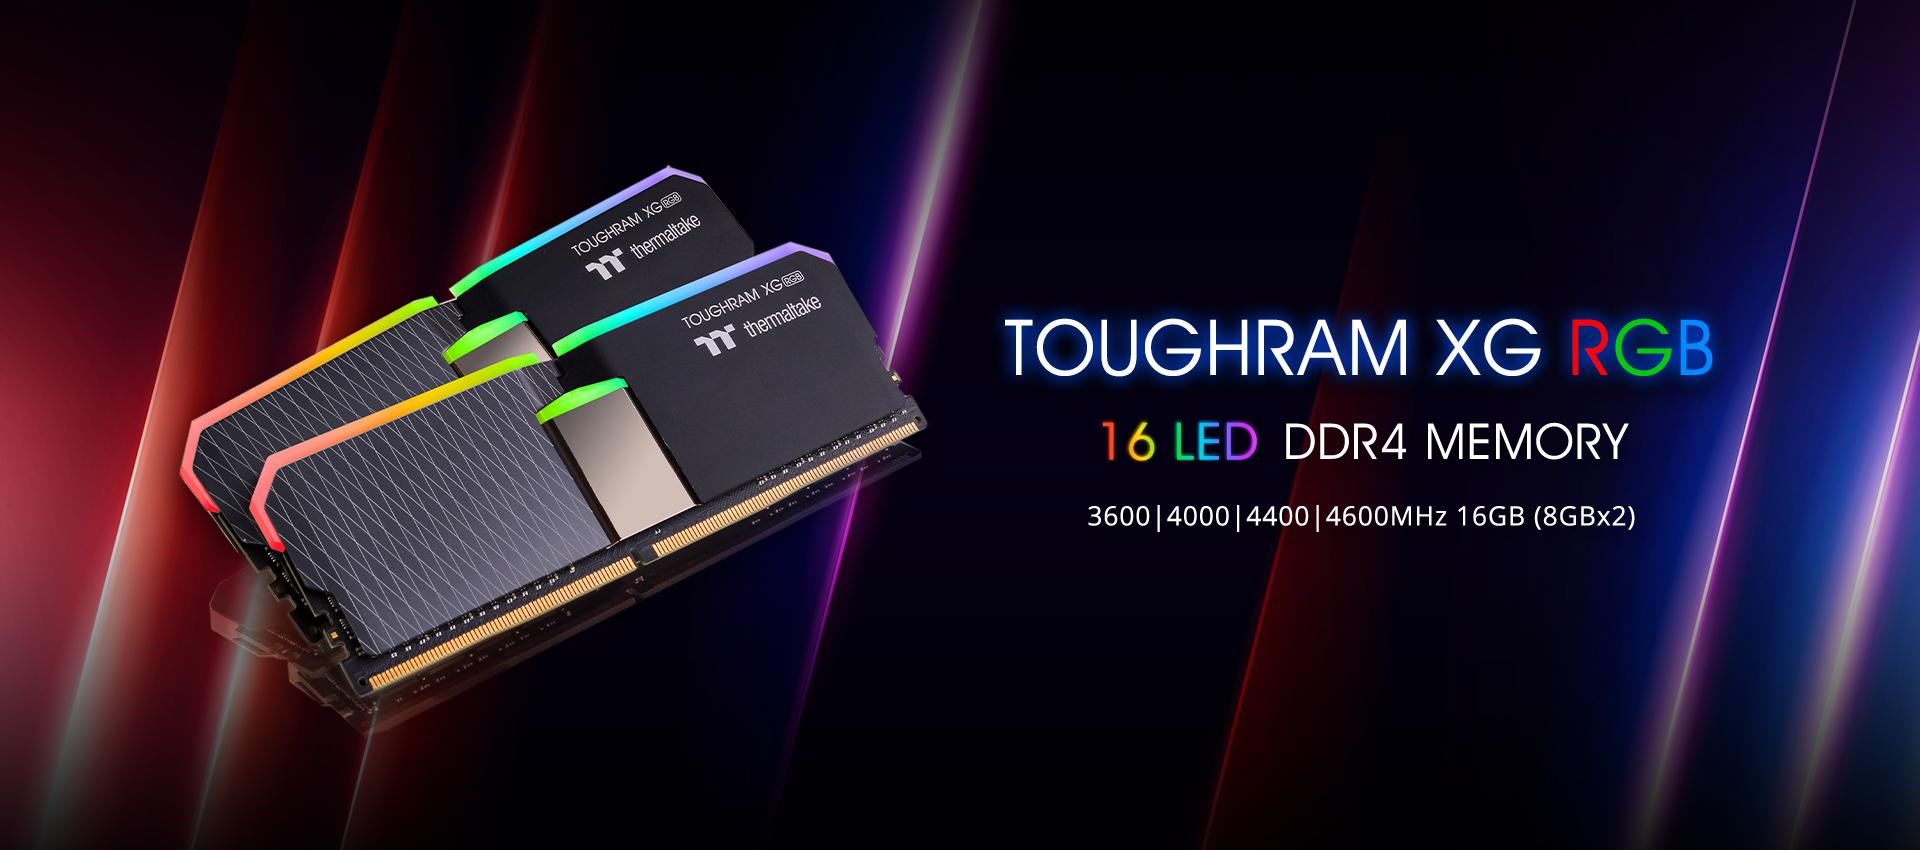 TOUGHRAM XG RGB Memory DDR4